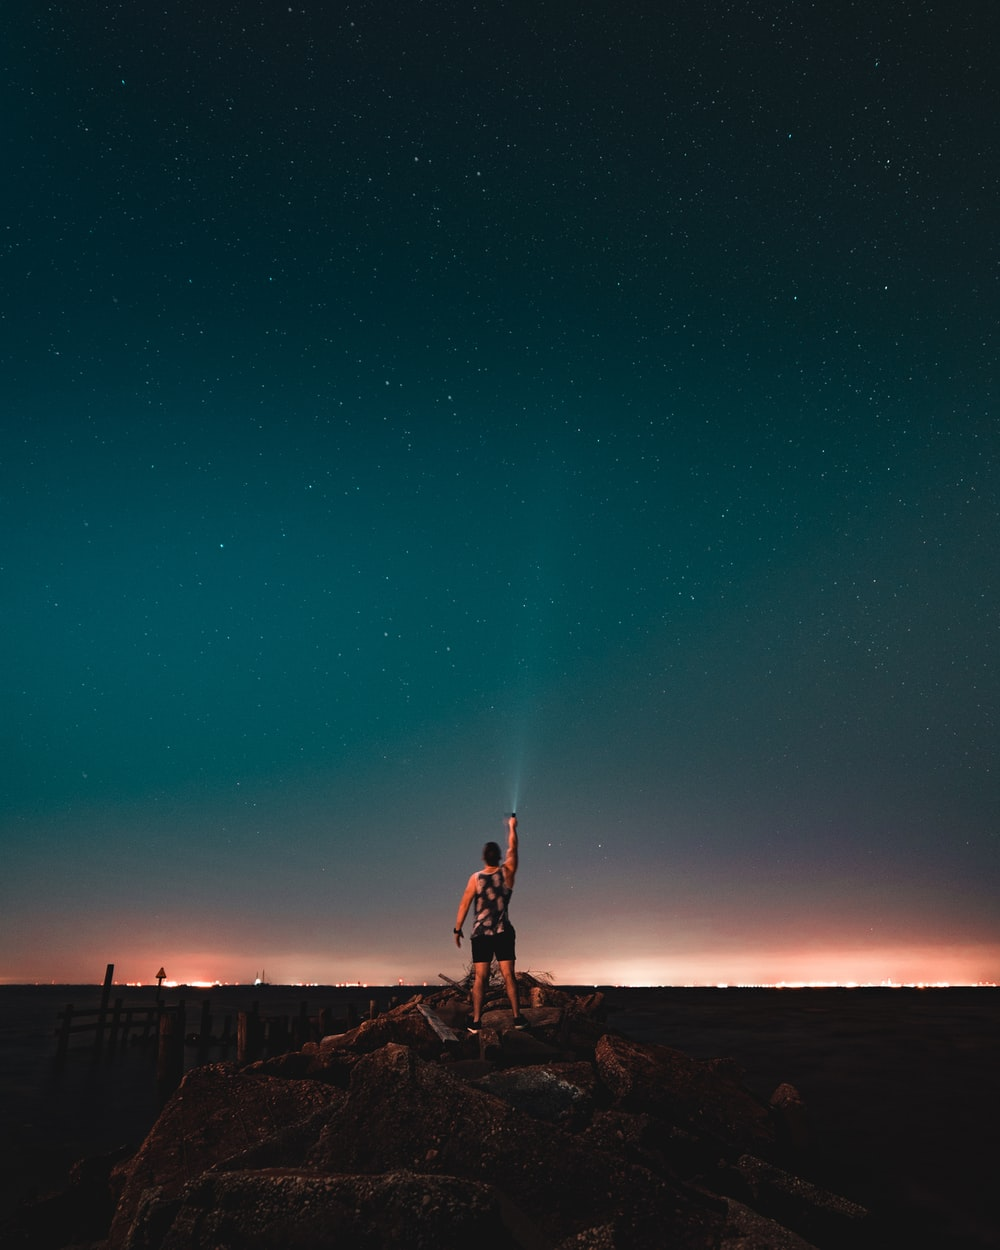 man holding flashlight turned on towards above the sky